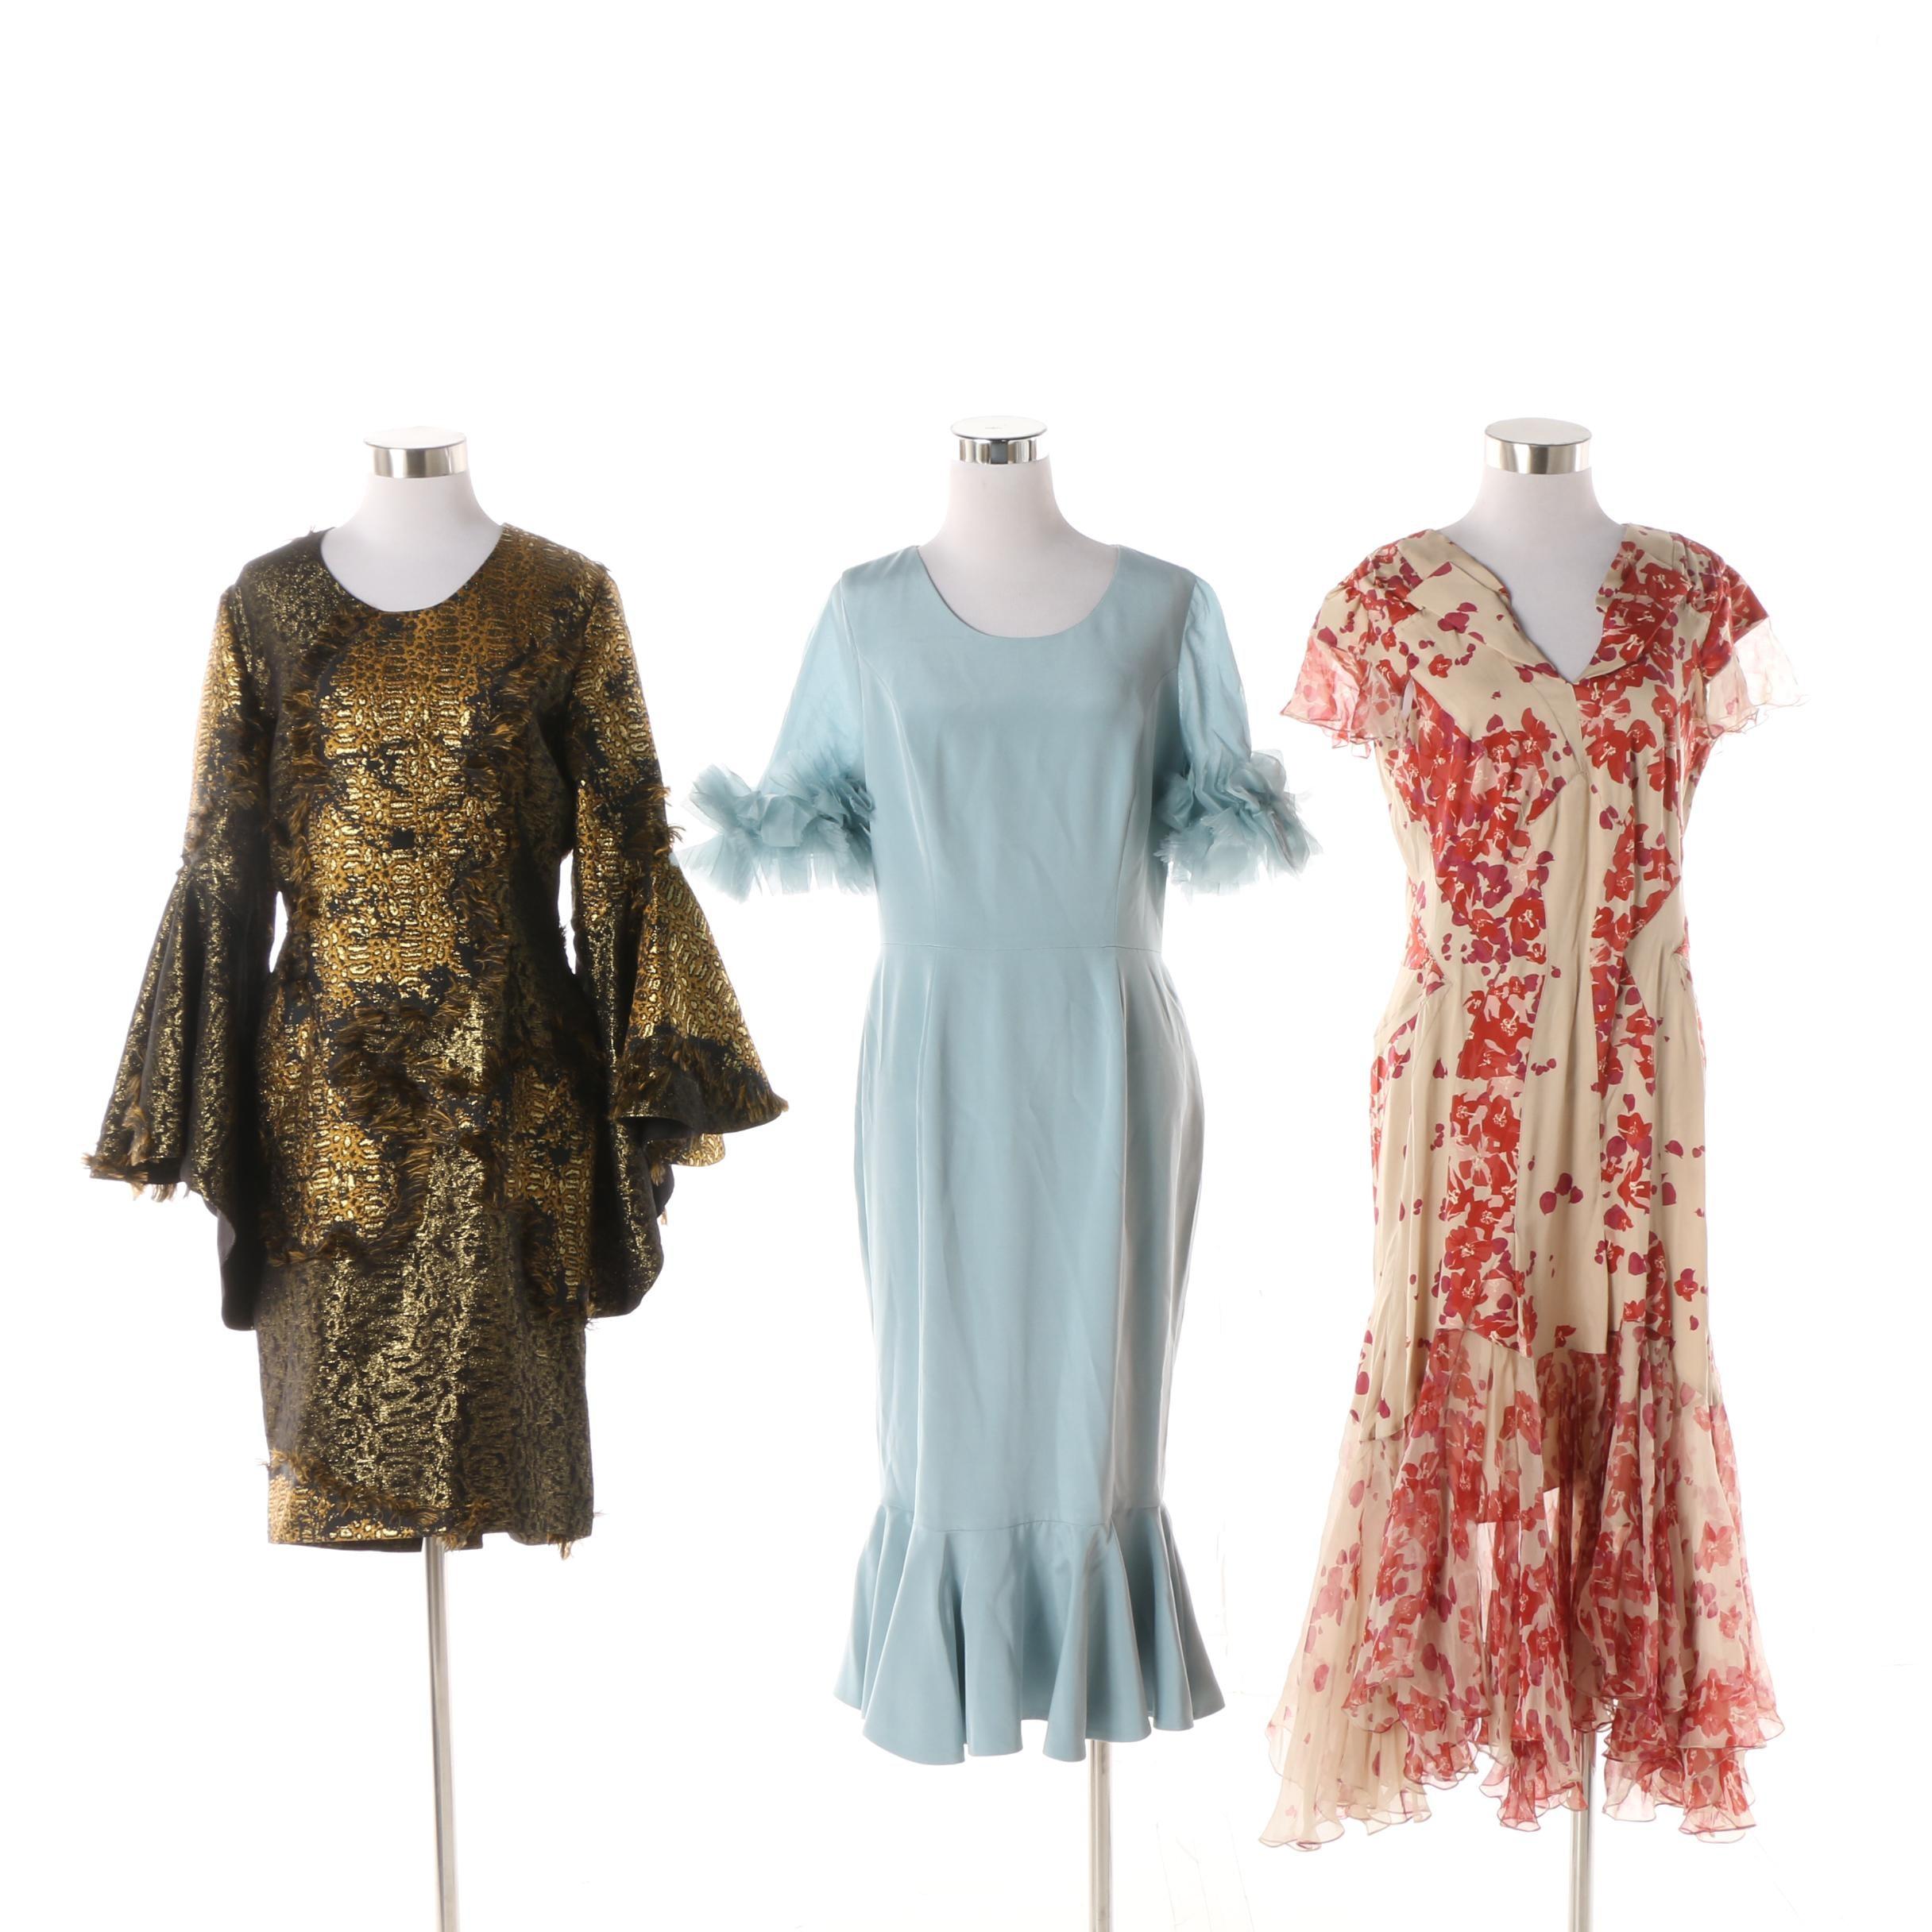 Christian Siriano and Zac Posen Occasion Dresses